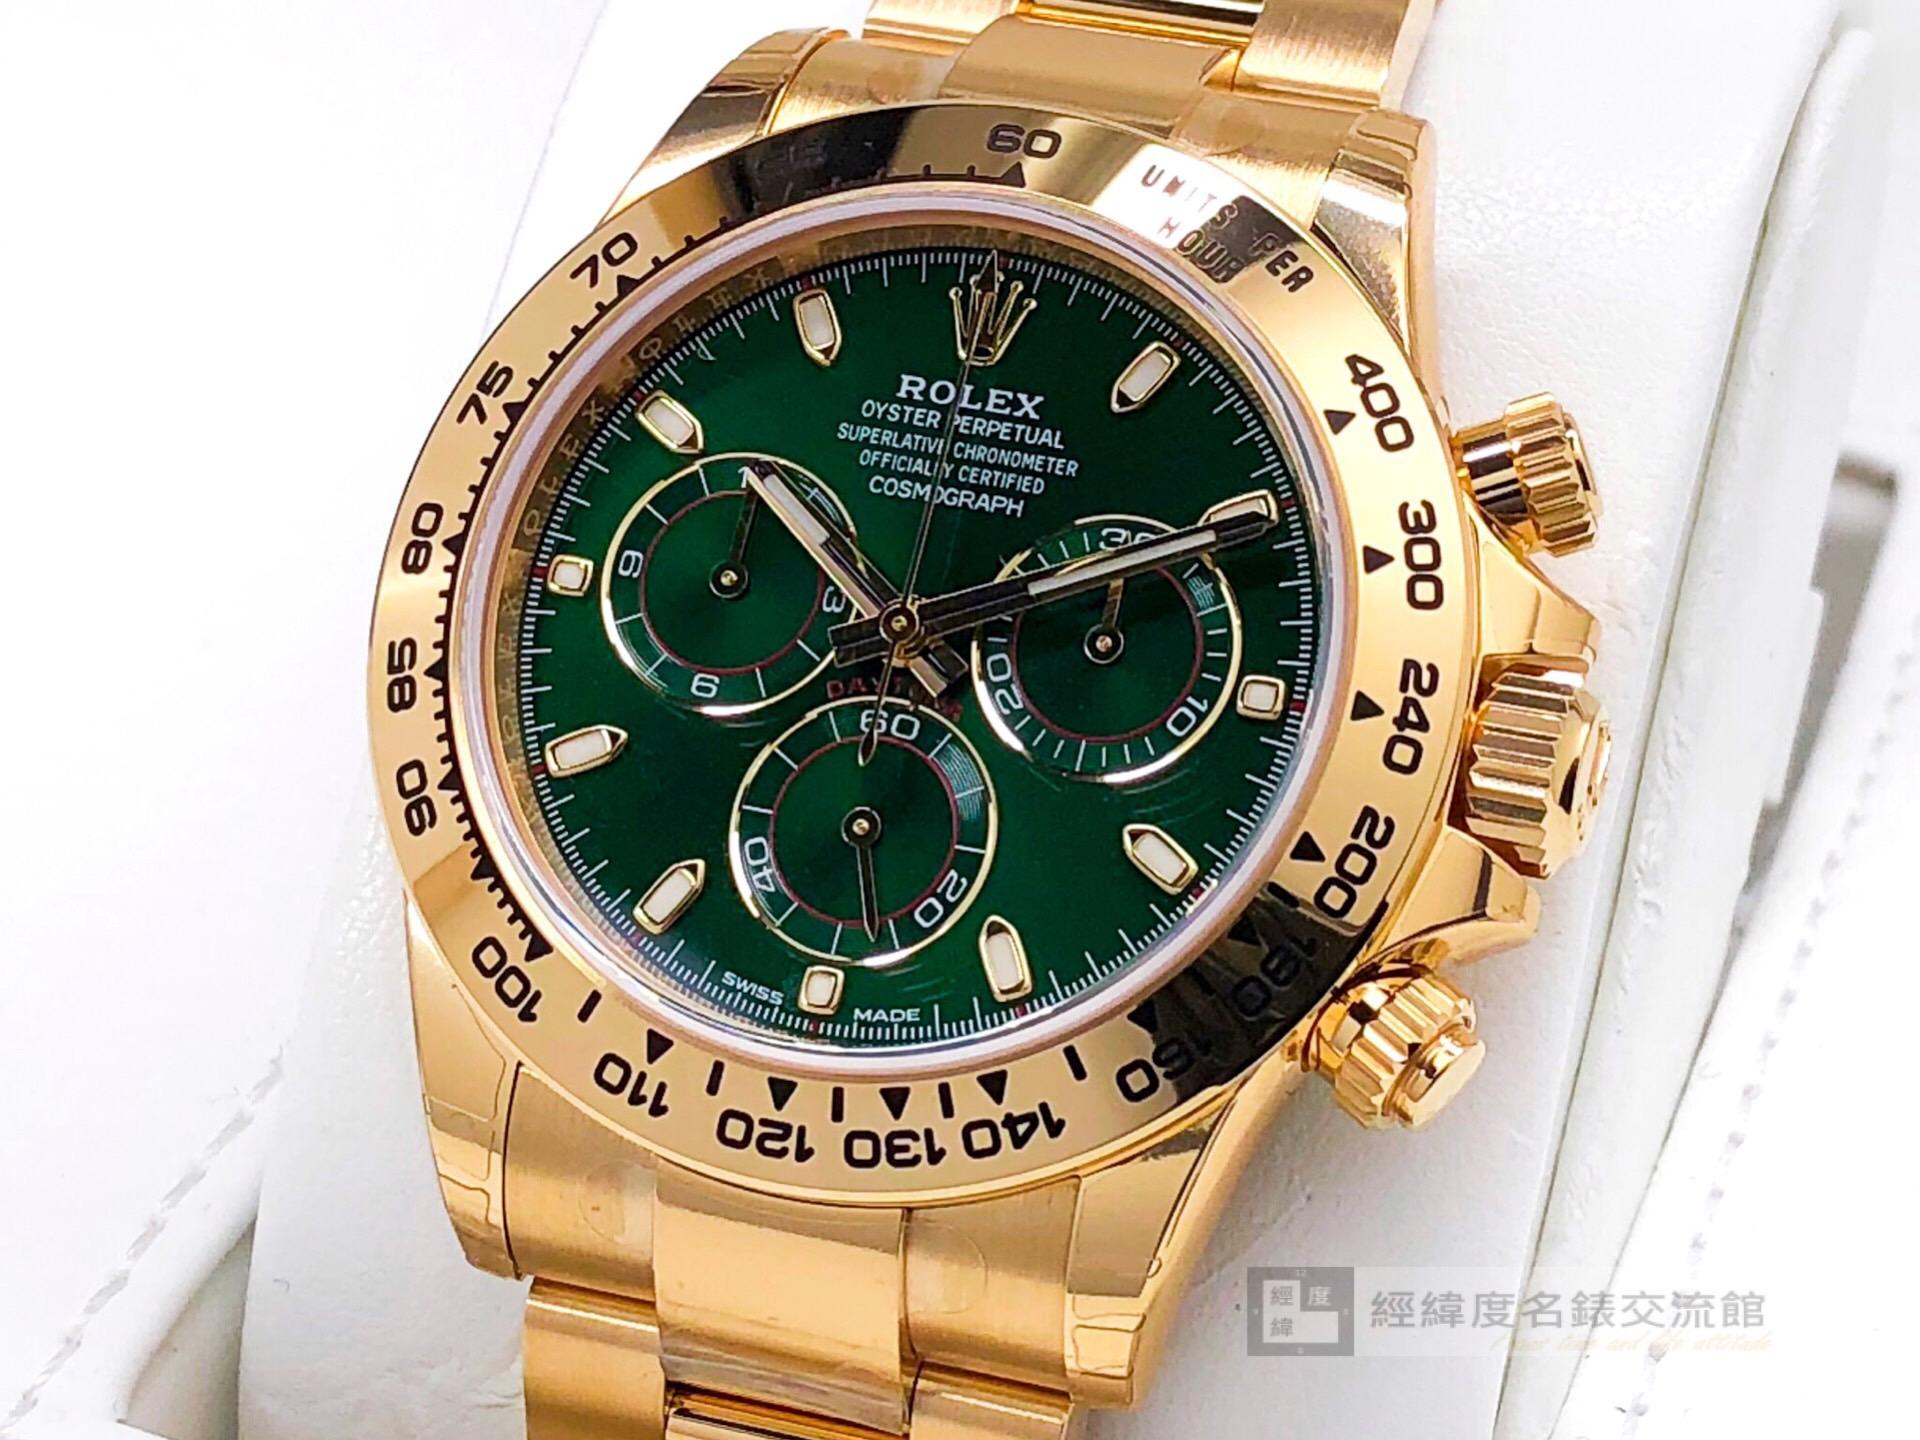 timeless design 788c5 b7d6d 中古錶二手錶經緯度名錶交流館TimeLifeWatches 交流買賣寄賣